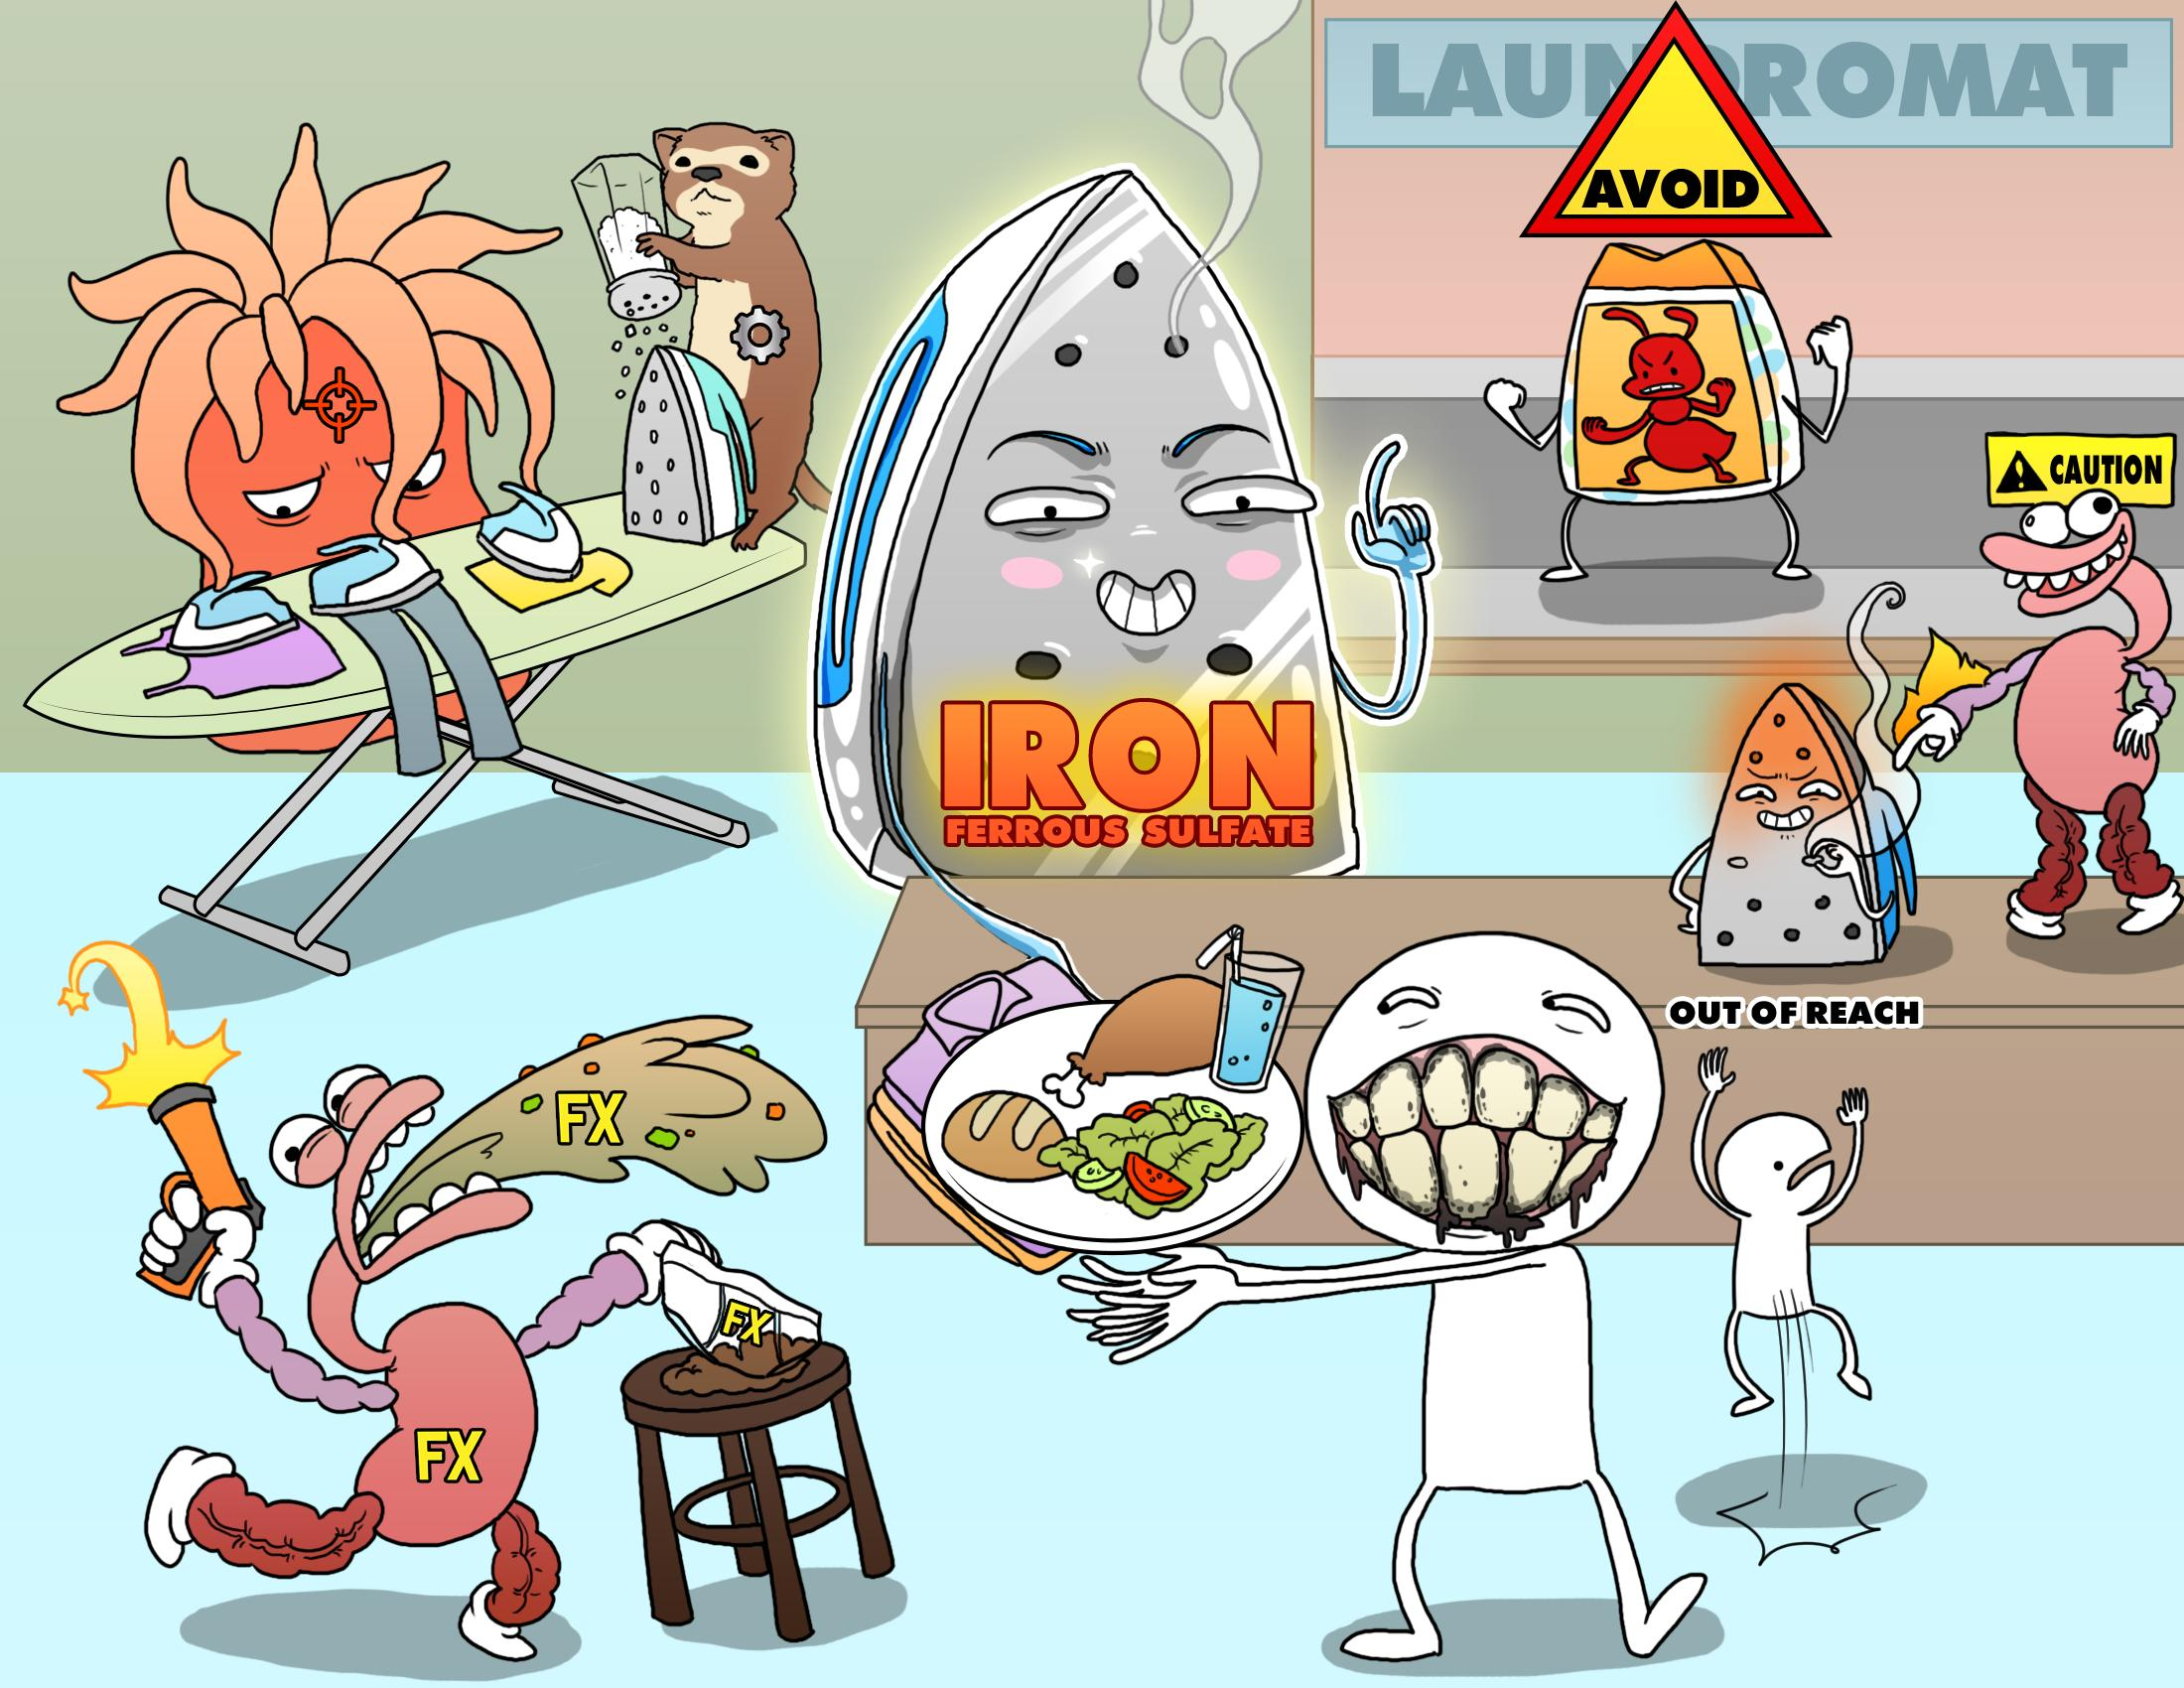 Iron (Ferrous Sulfate)